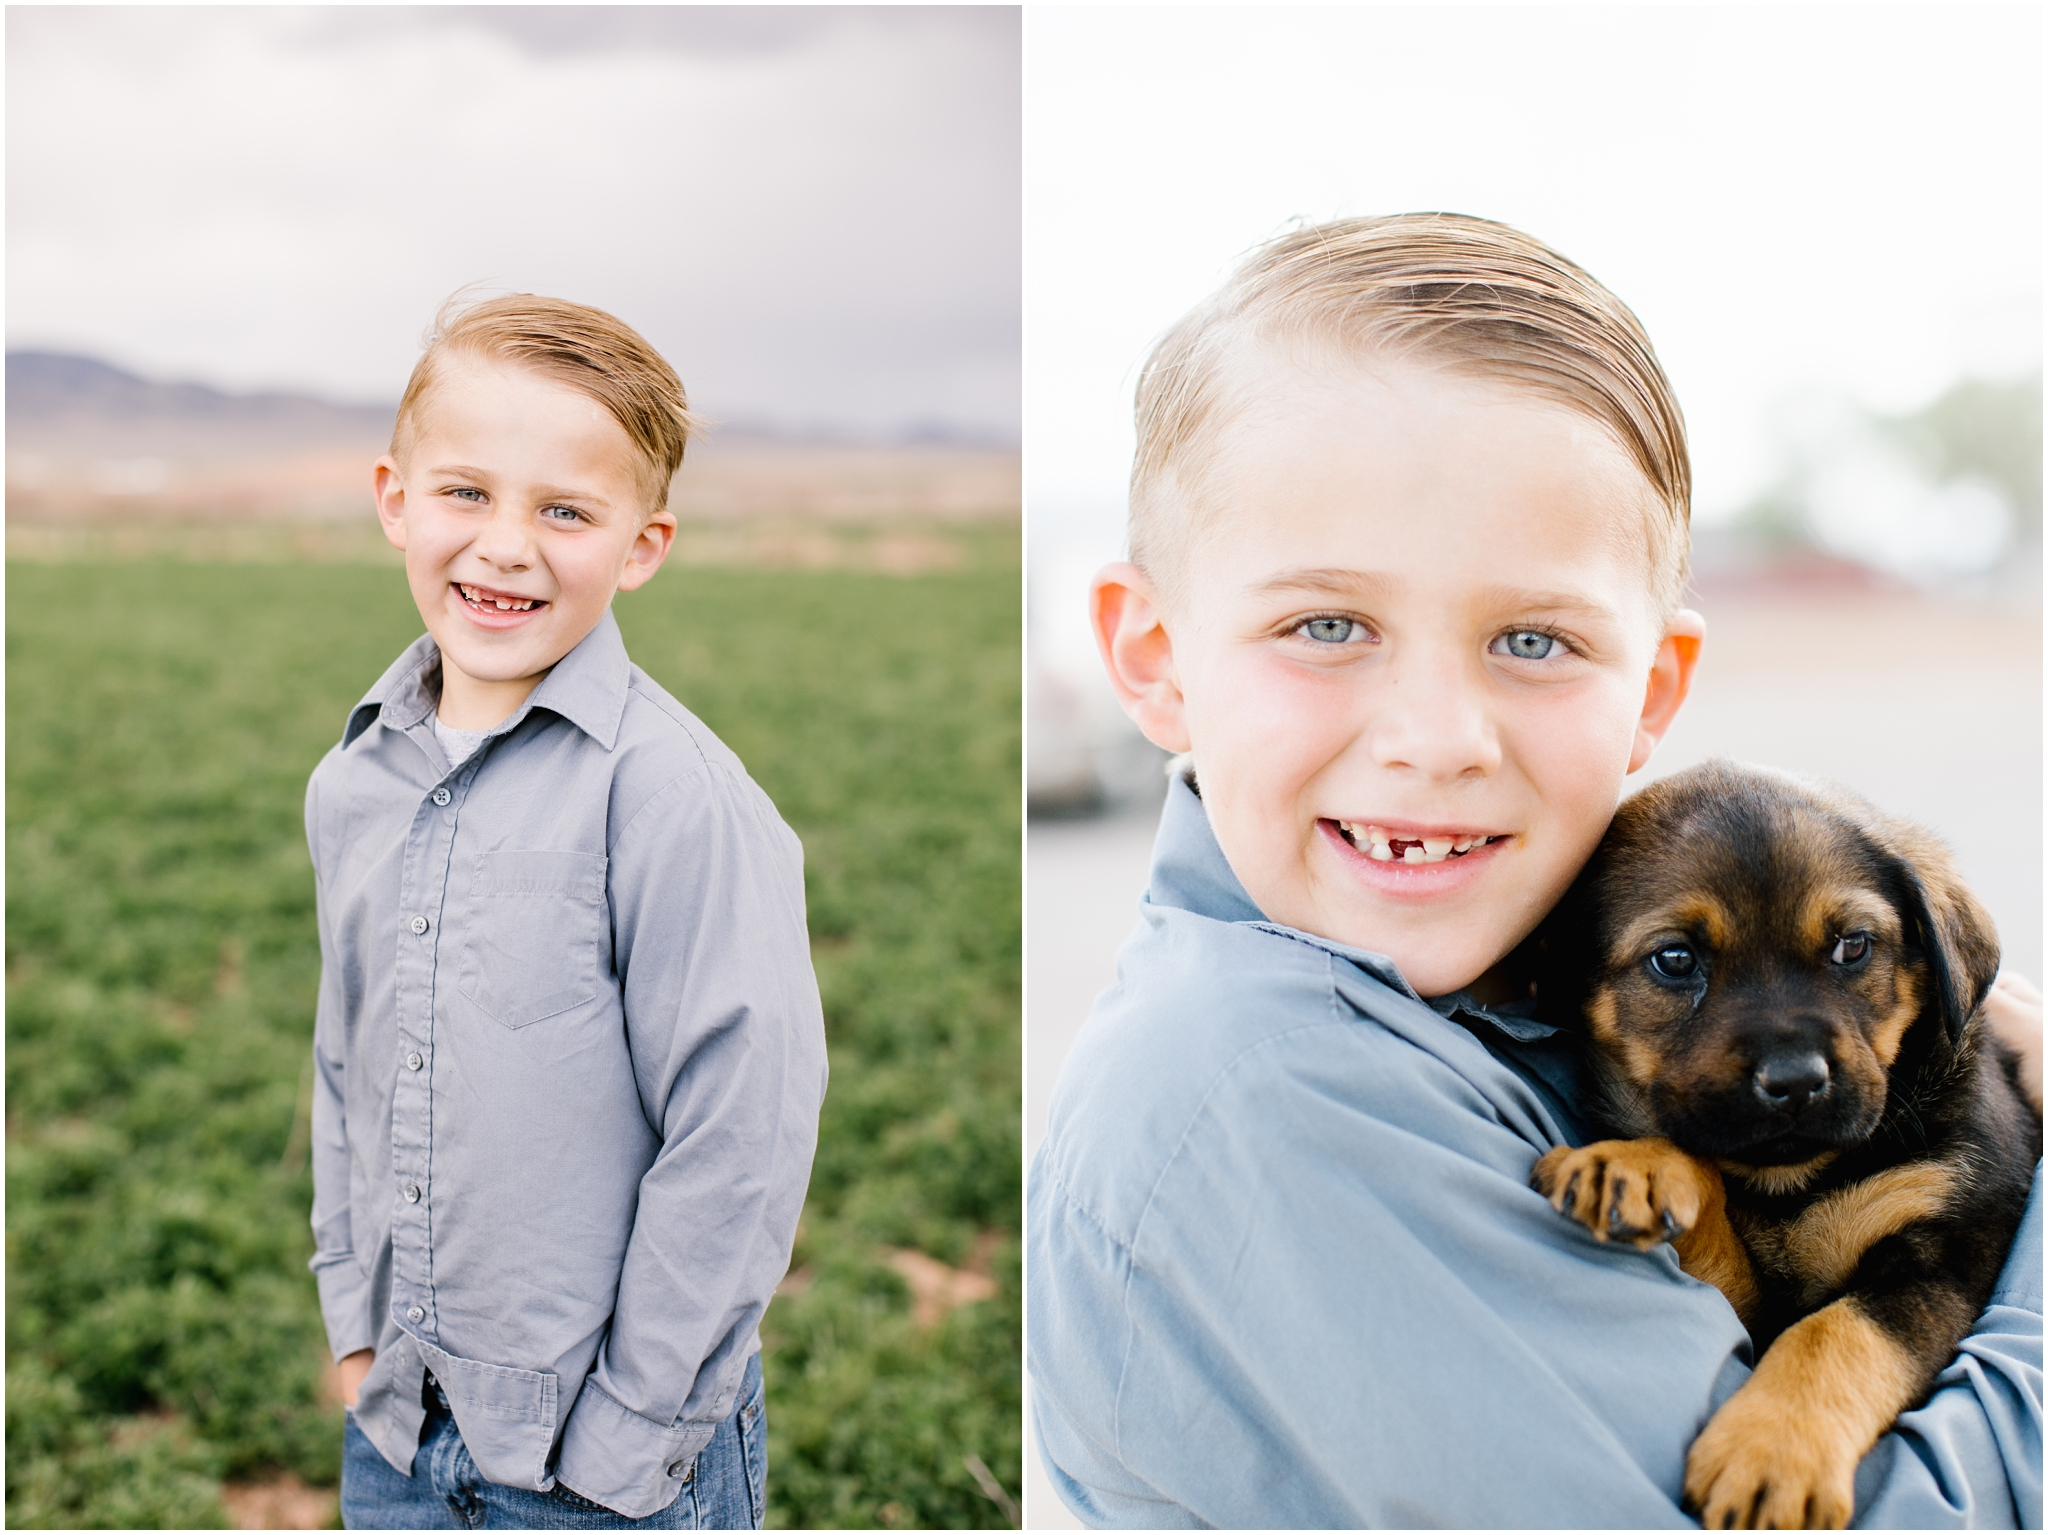 Conner-42_Lizzie-B-Imagery-Utah-Family-Photographer-Salt-Lake-City-Park-City-Utah-County.jpg